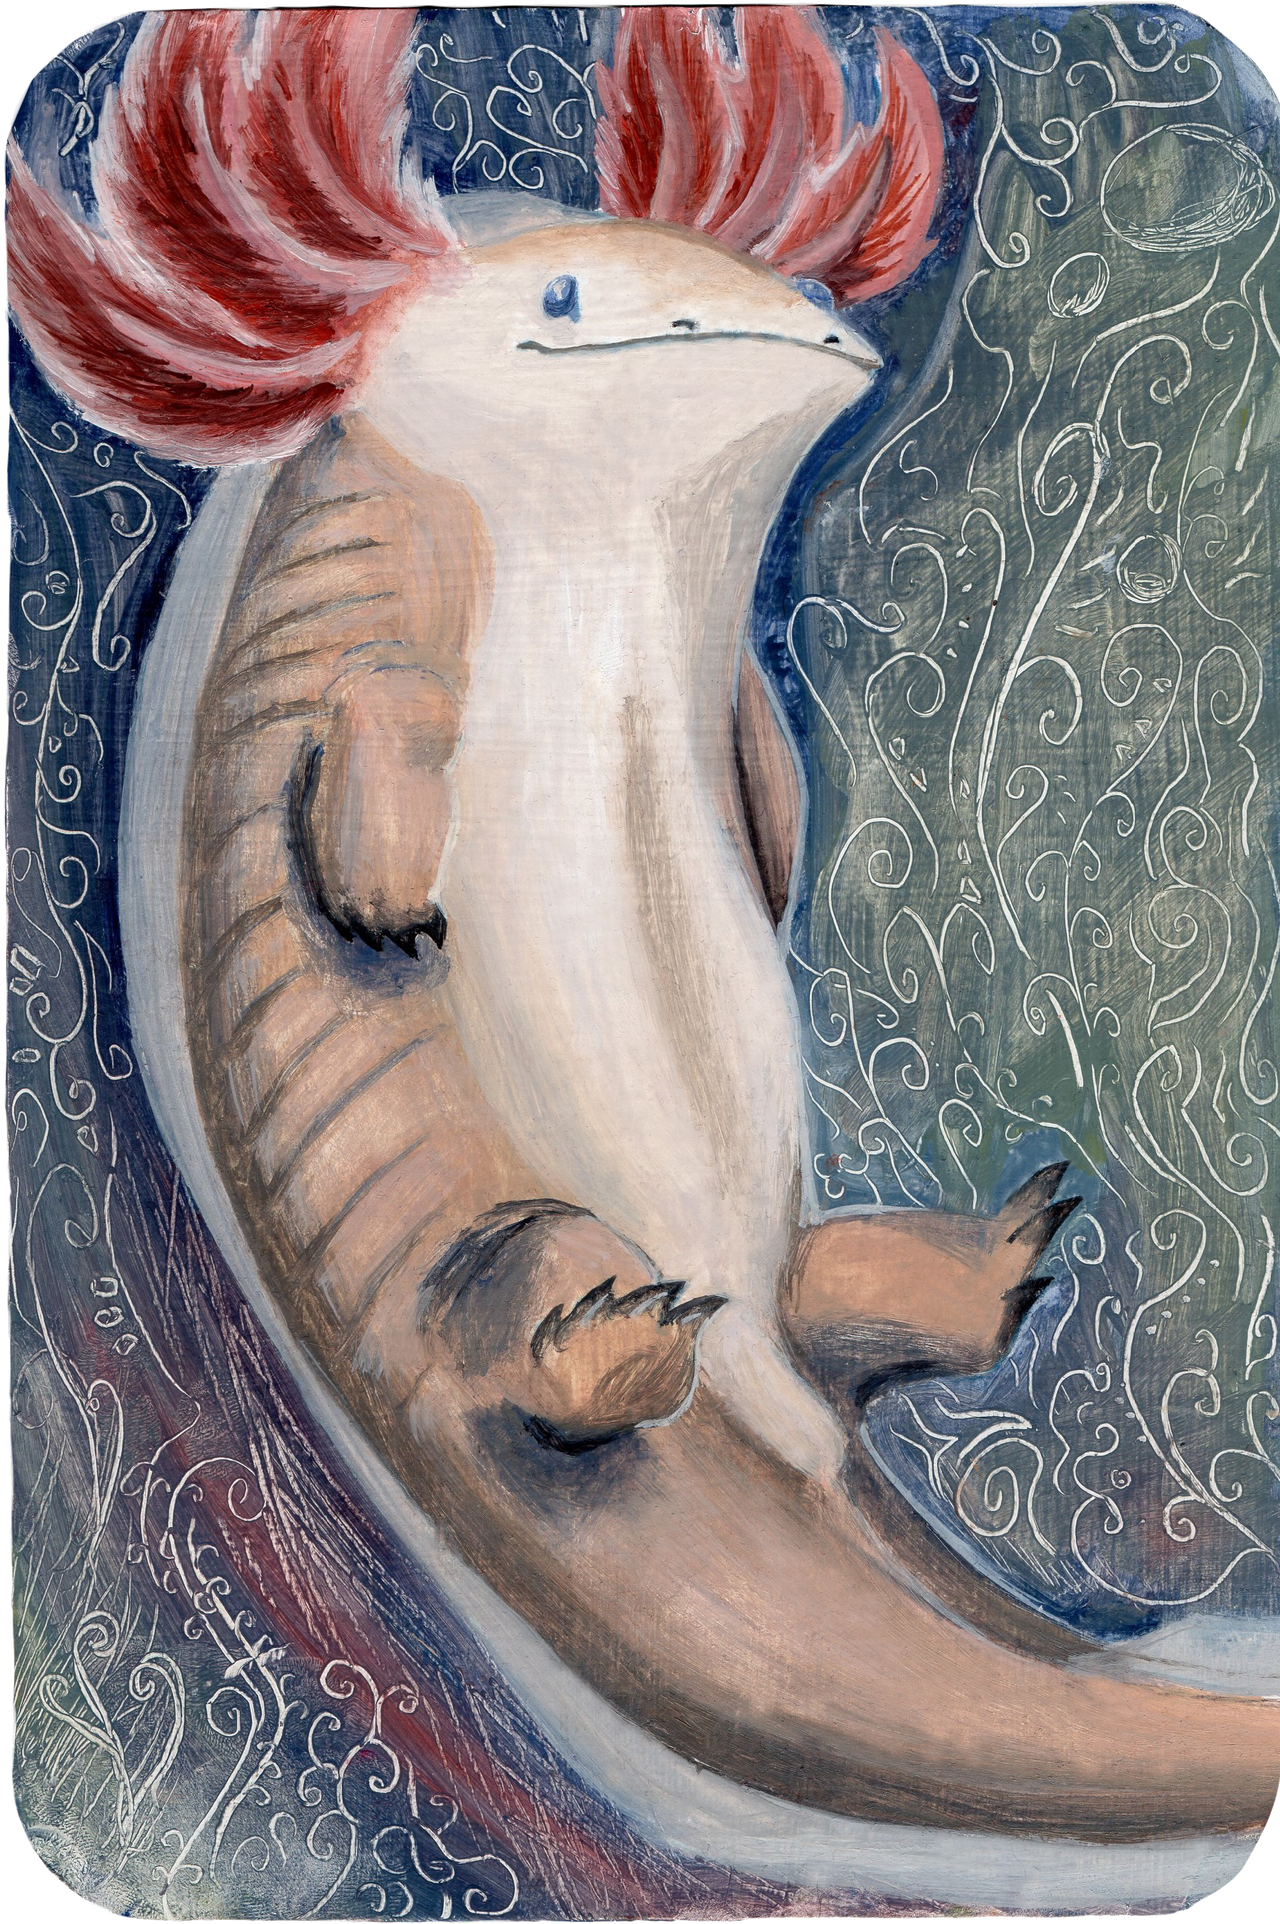 Big Axolotl by ThreeLeaves